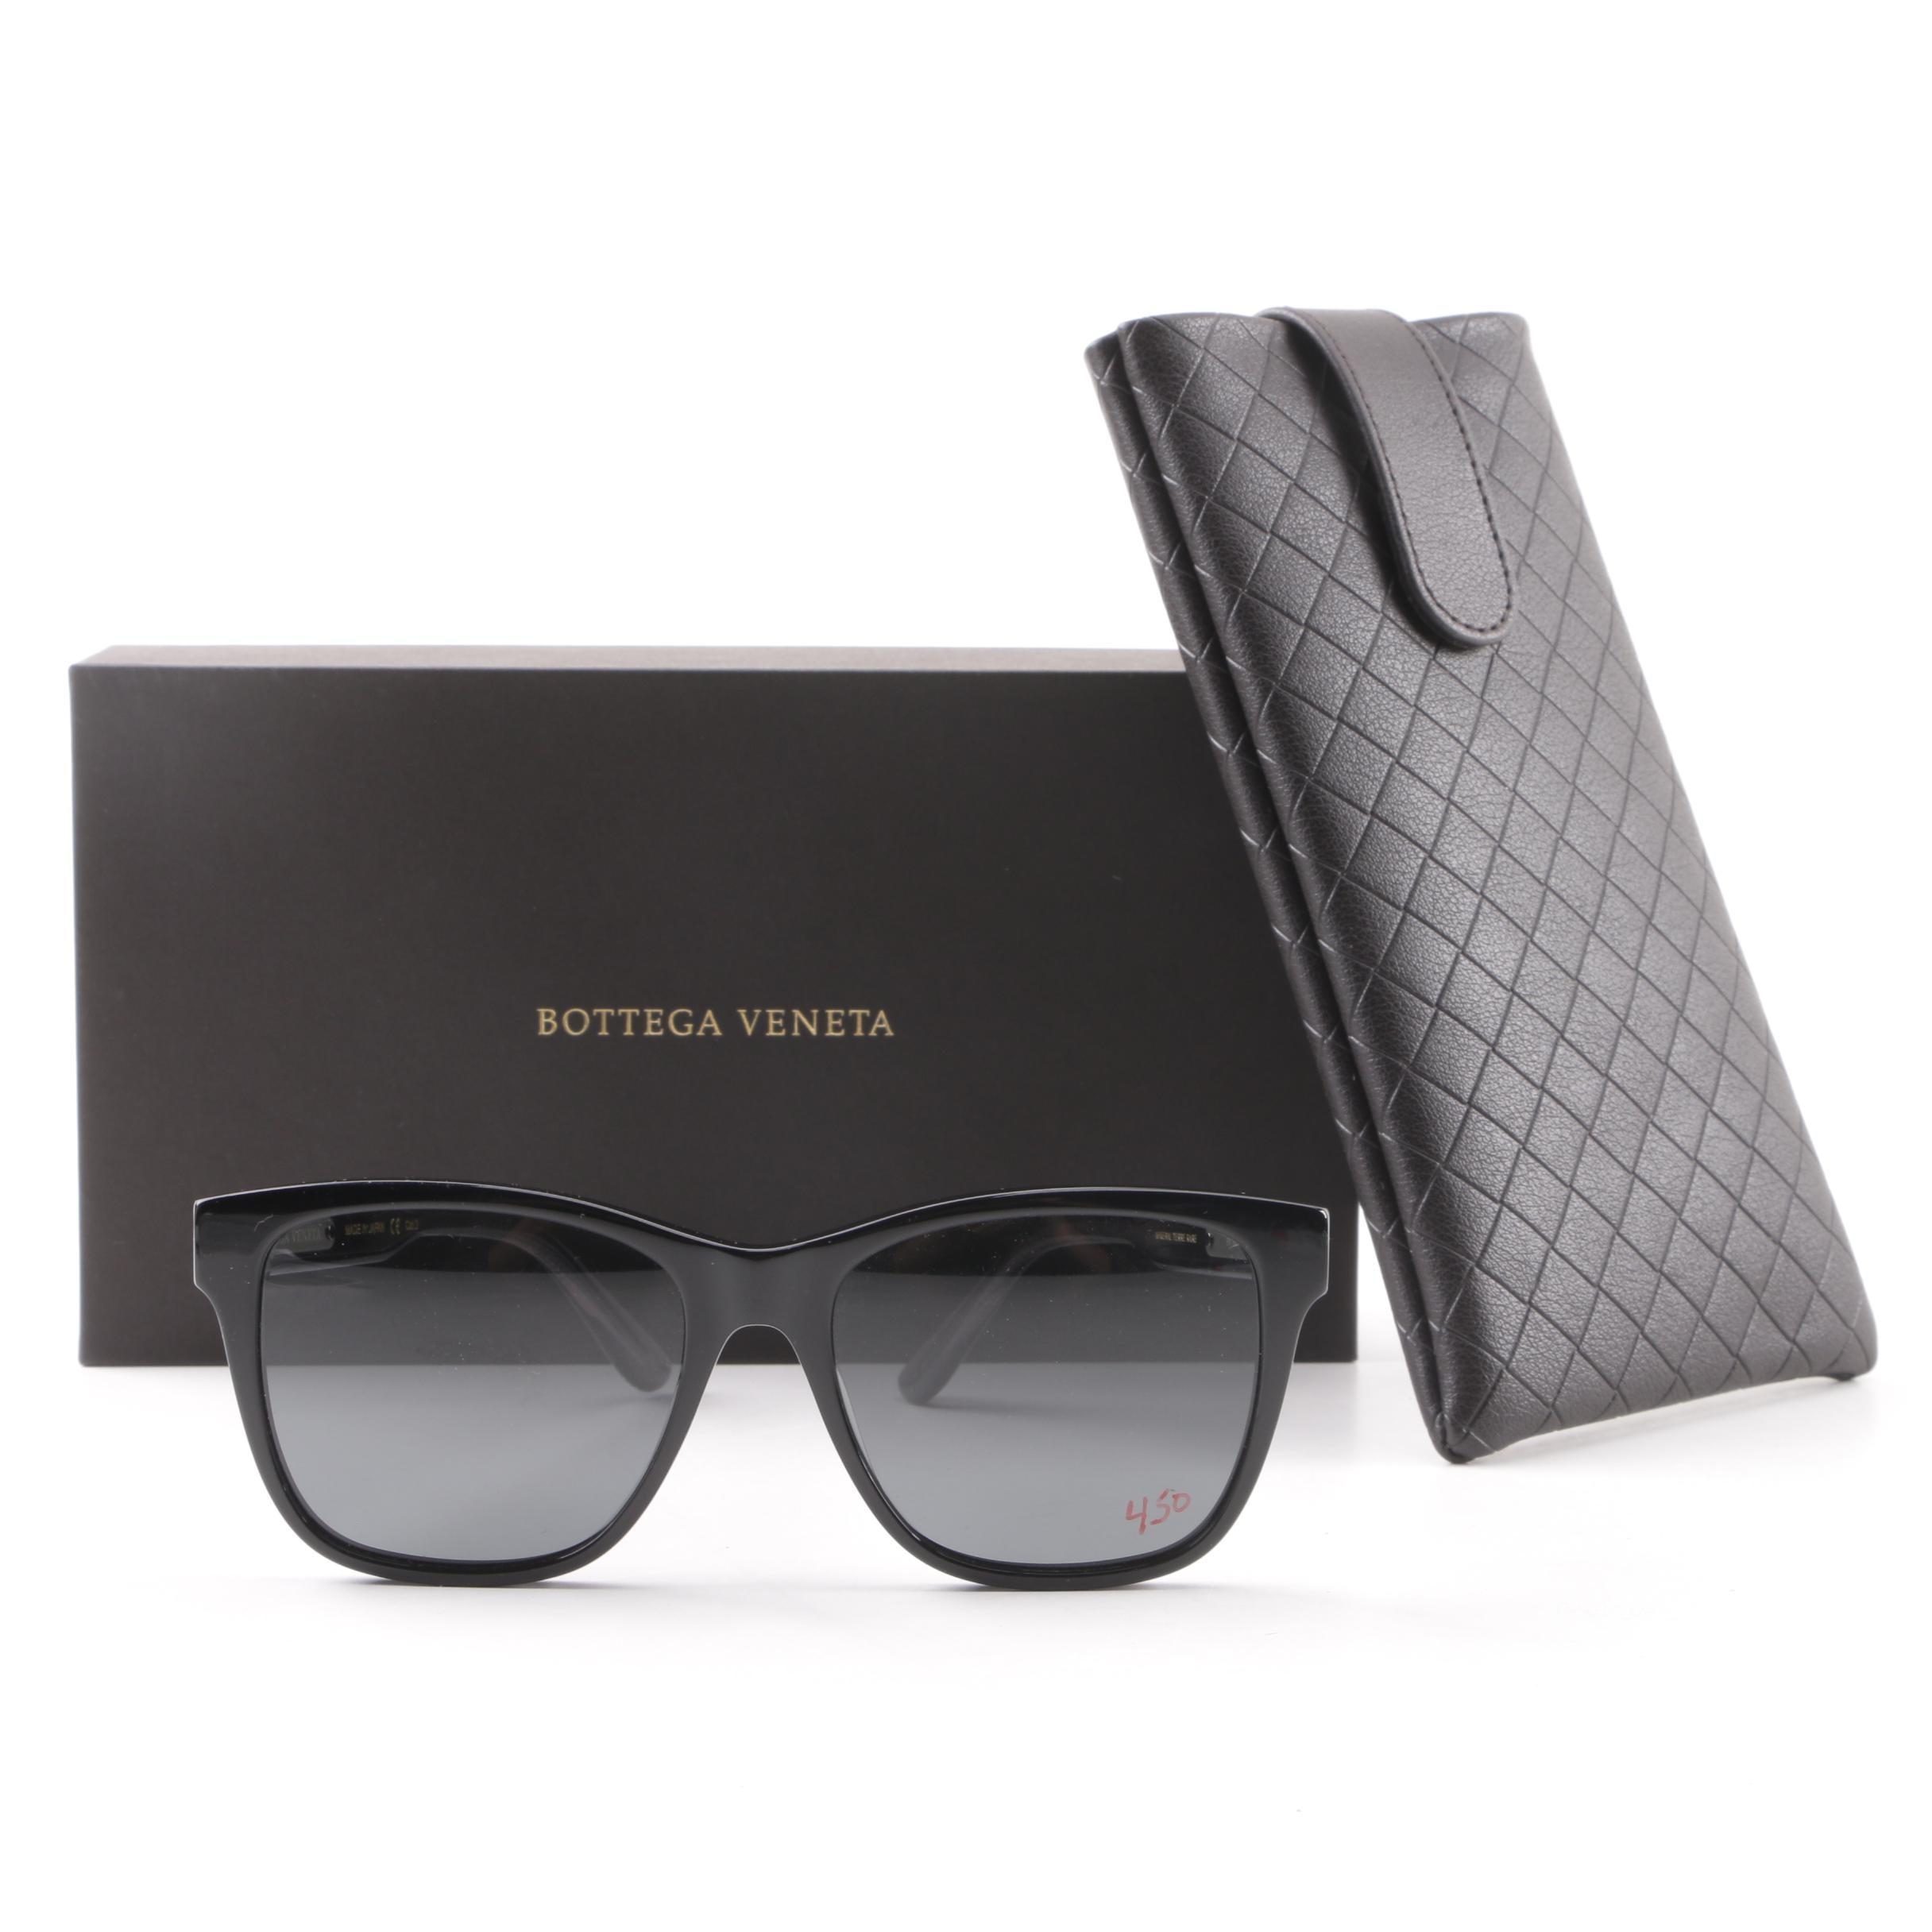 Bottega Veneta Mineral Terre Rare Sunglasses with Case